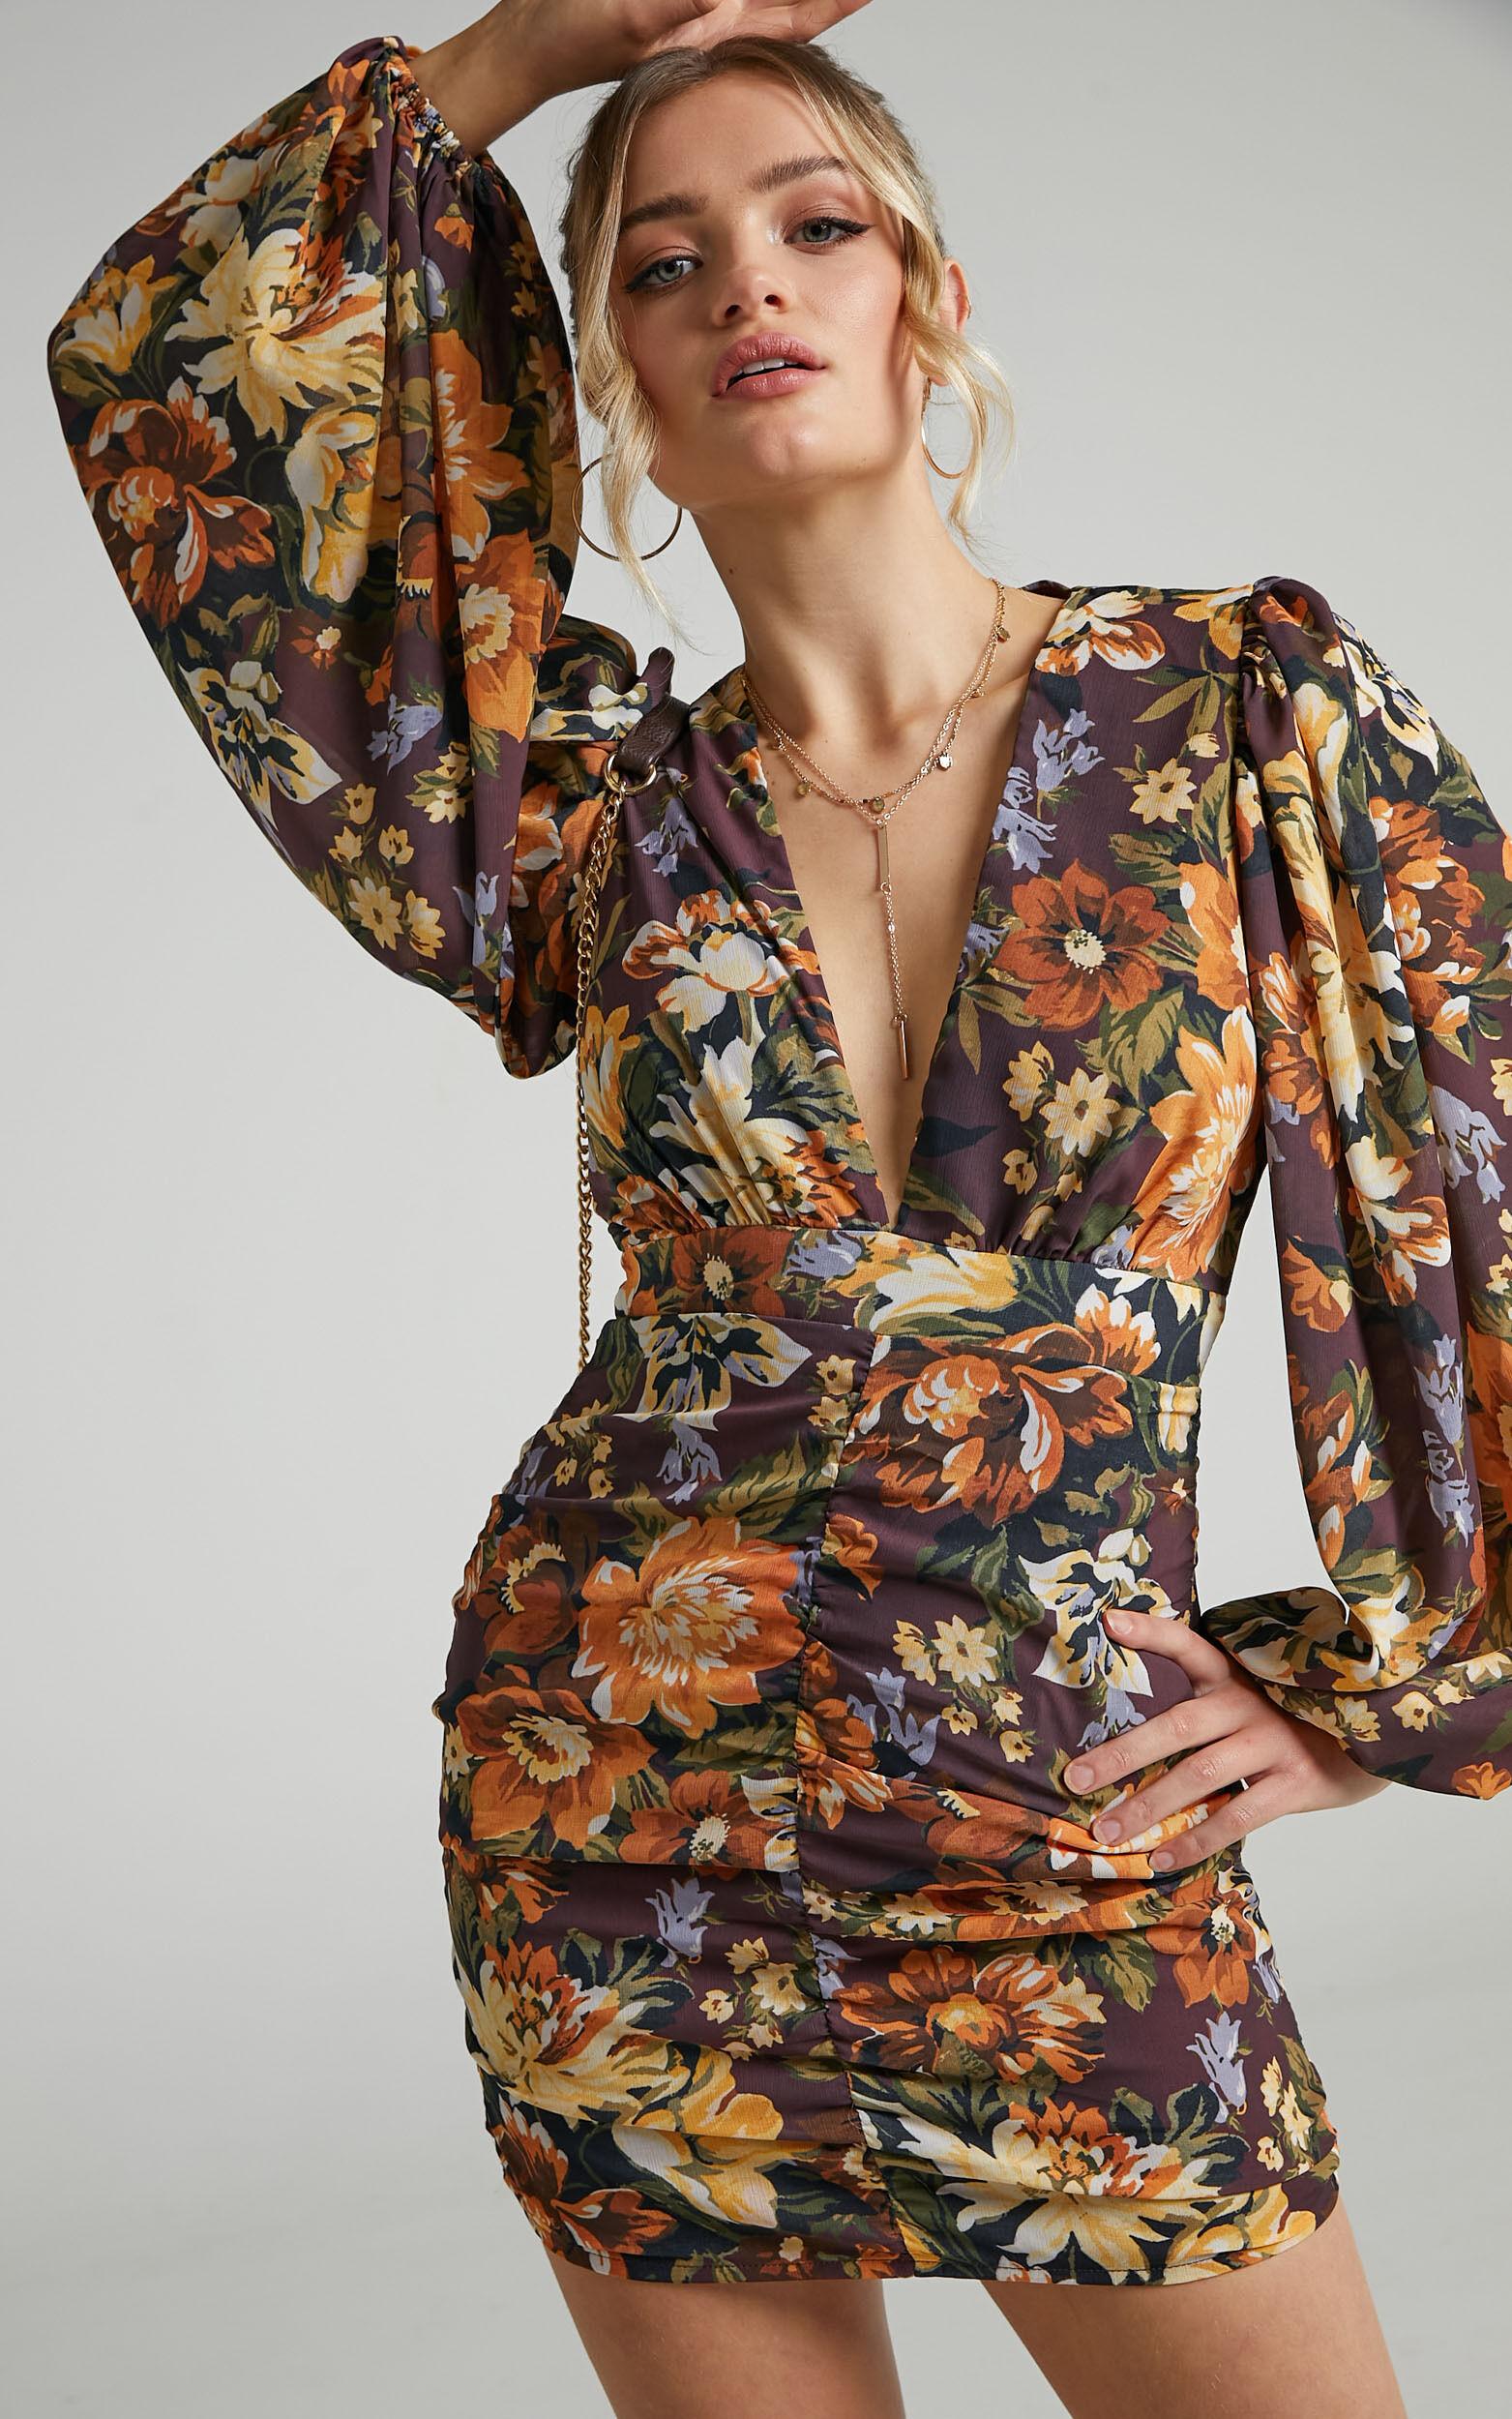 Latiana Ruched Plunge Neck Mini dress in Indulgent Bloom - 04, BRN1, super-hi-res image number null